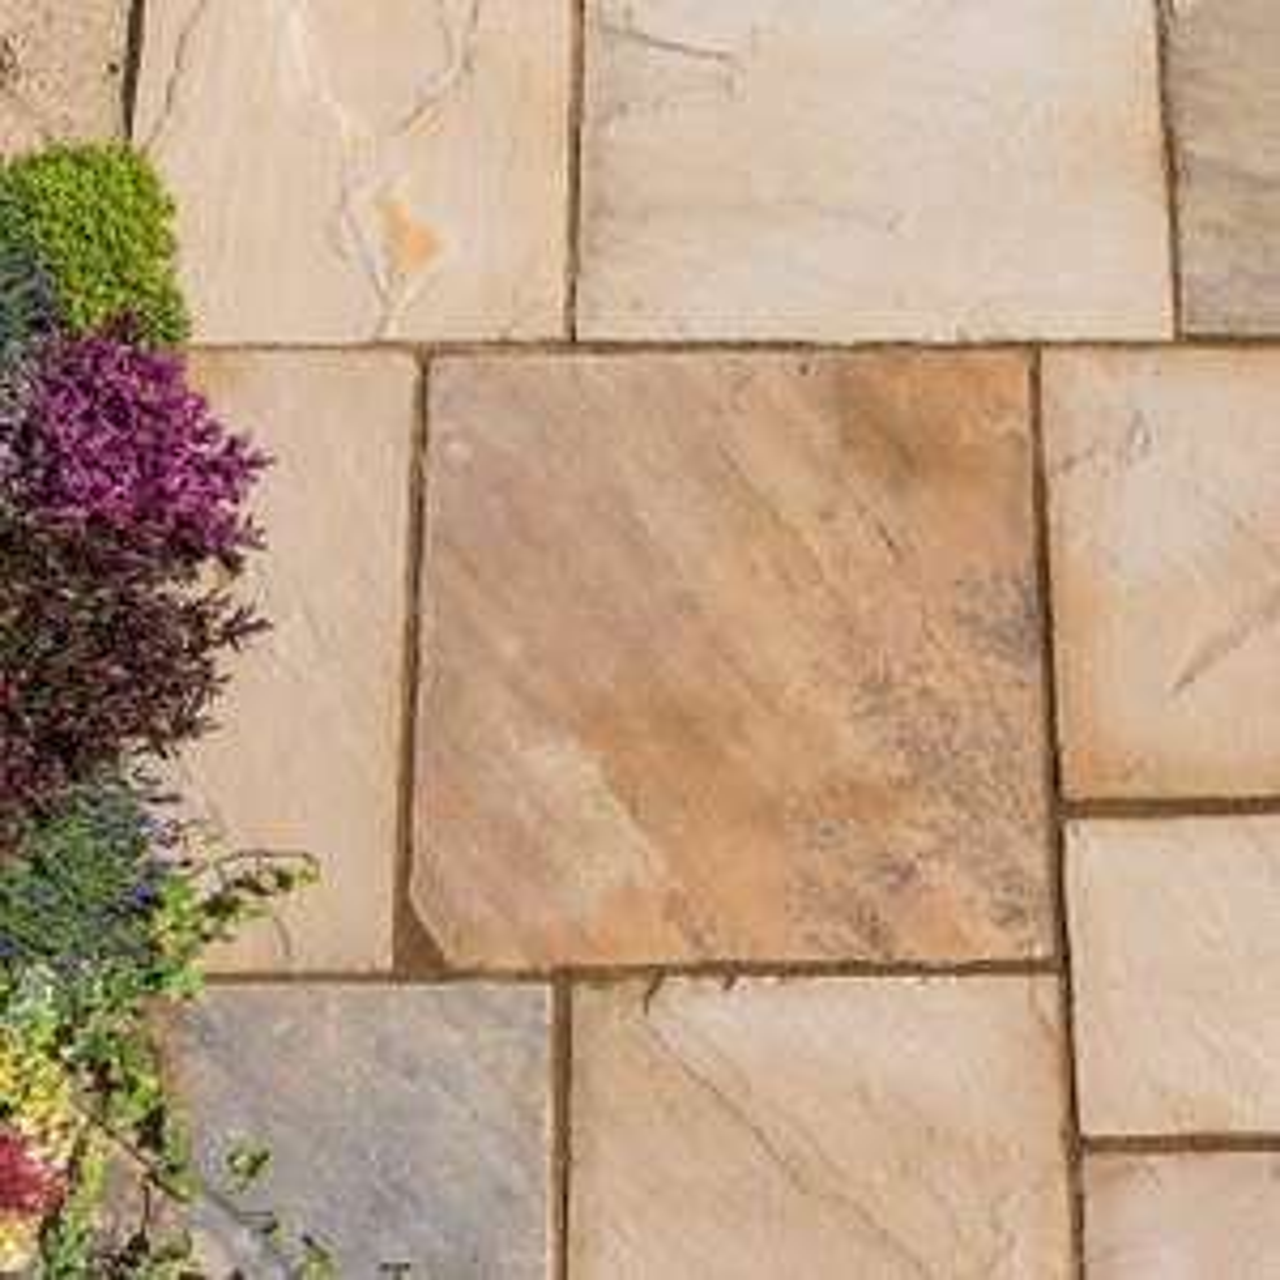 Kelkay Natural Sandstone Patio Pack (10.2 m2) £76.47 Dobbies Garden Centre